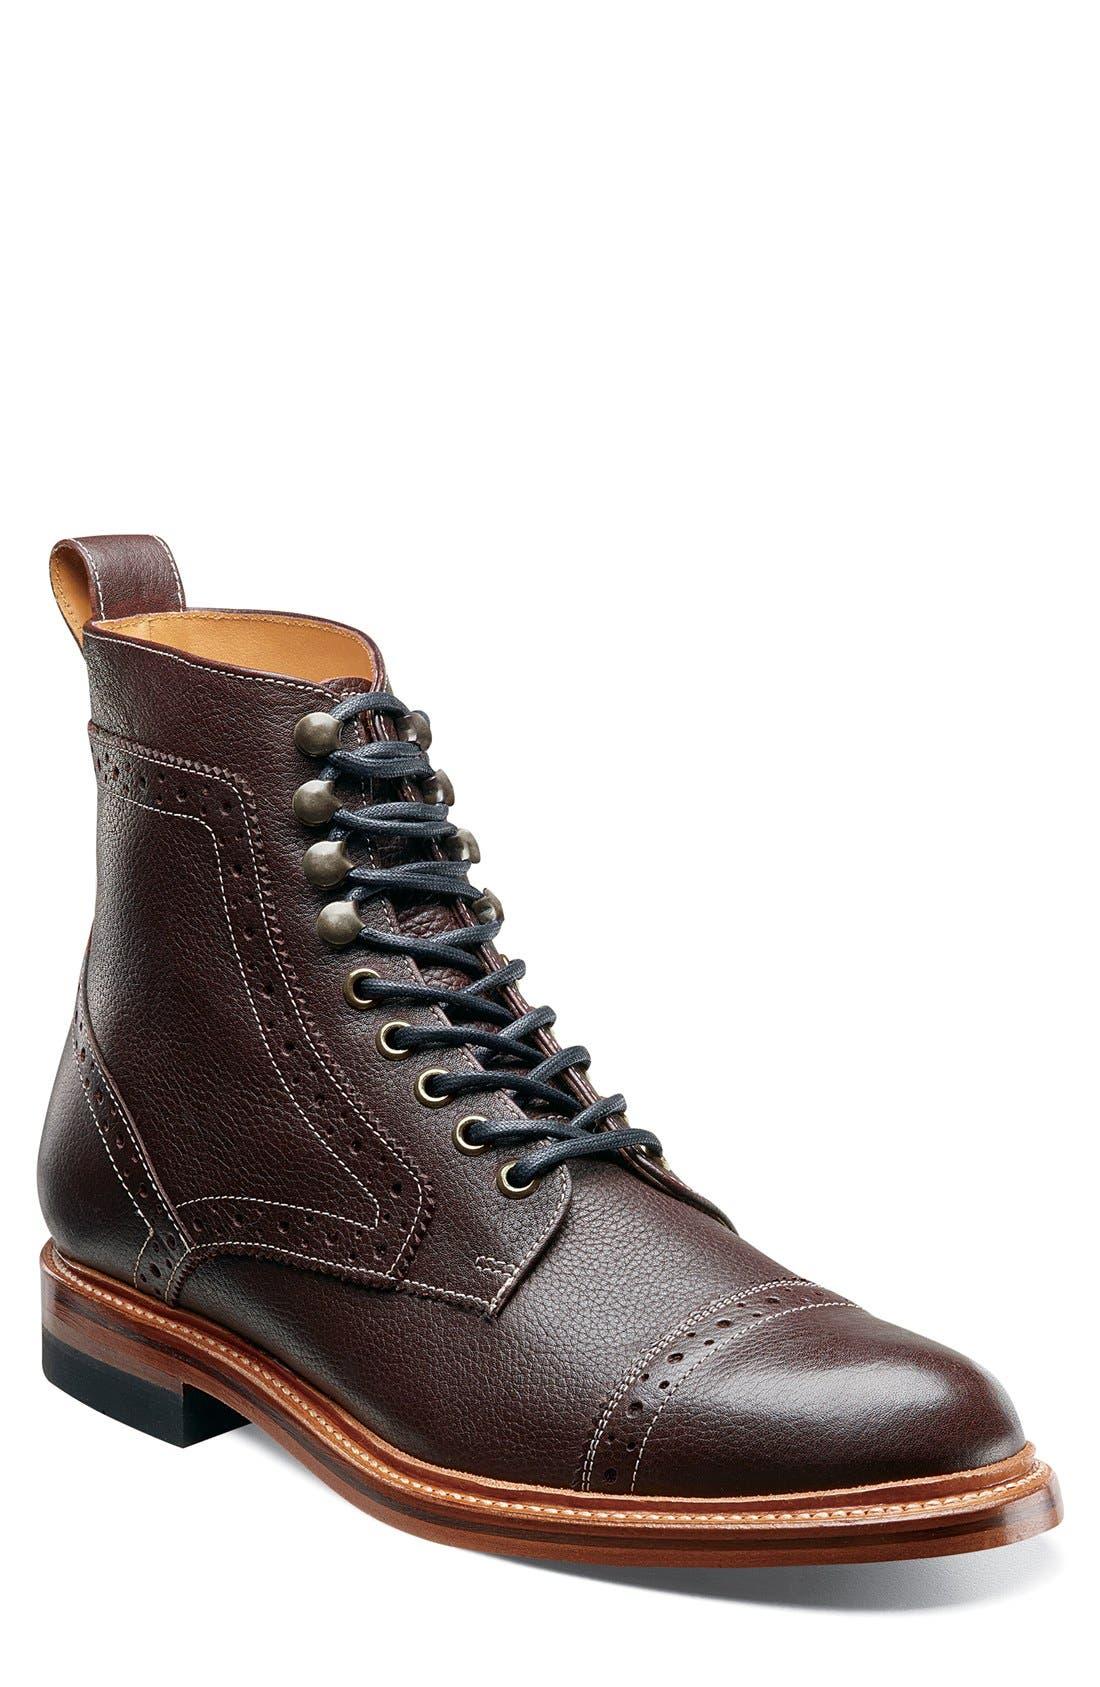 Madison II Cap Toe Boot,                         Main,                         color, 930